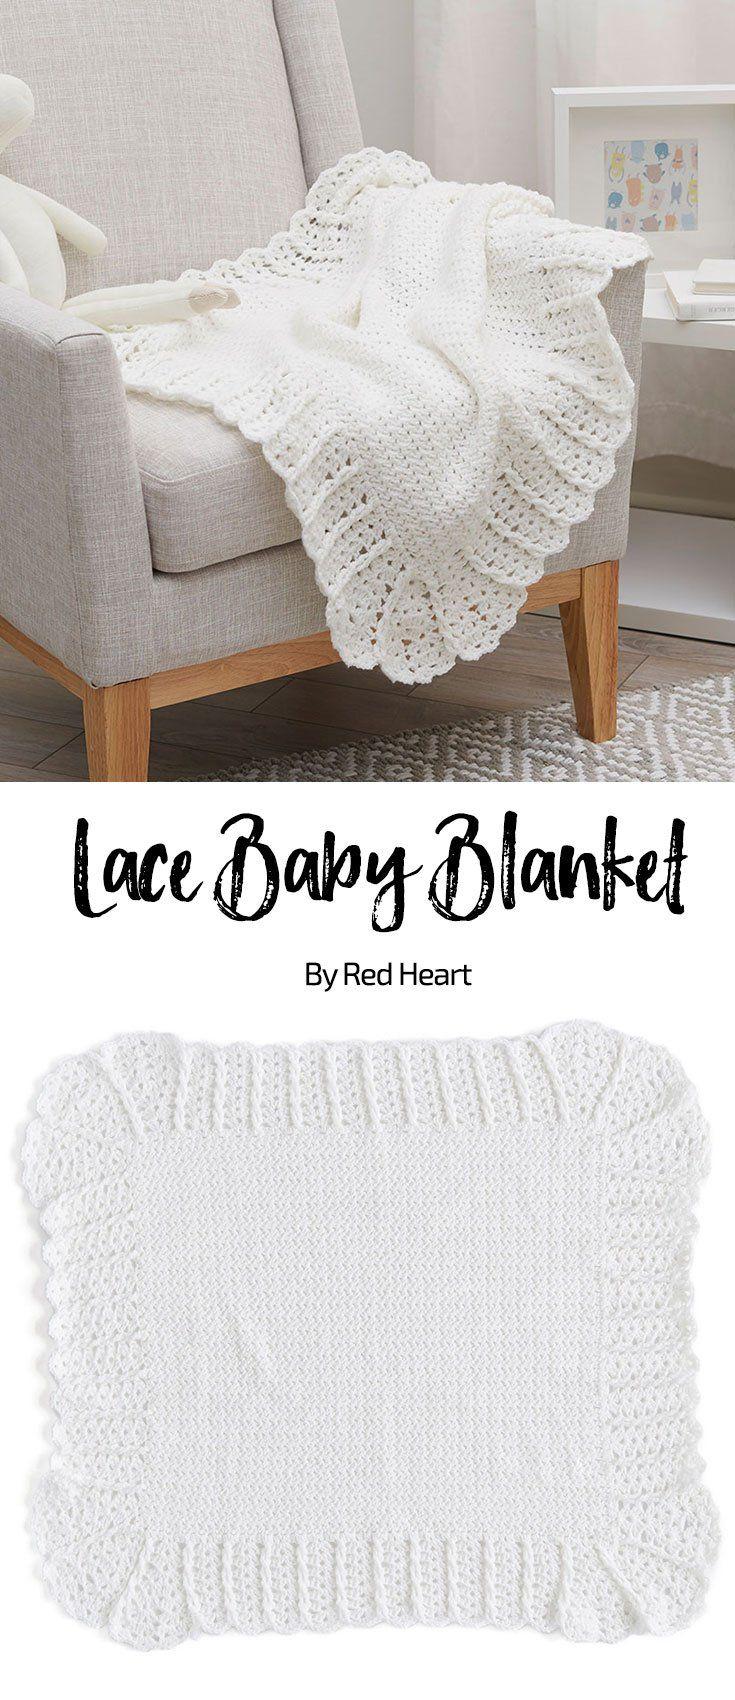 Lace Baby Blanket free crochet pattern in Bunches of Hugs yarn ...